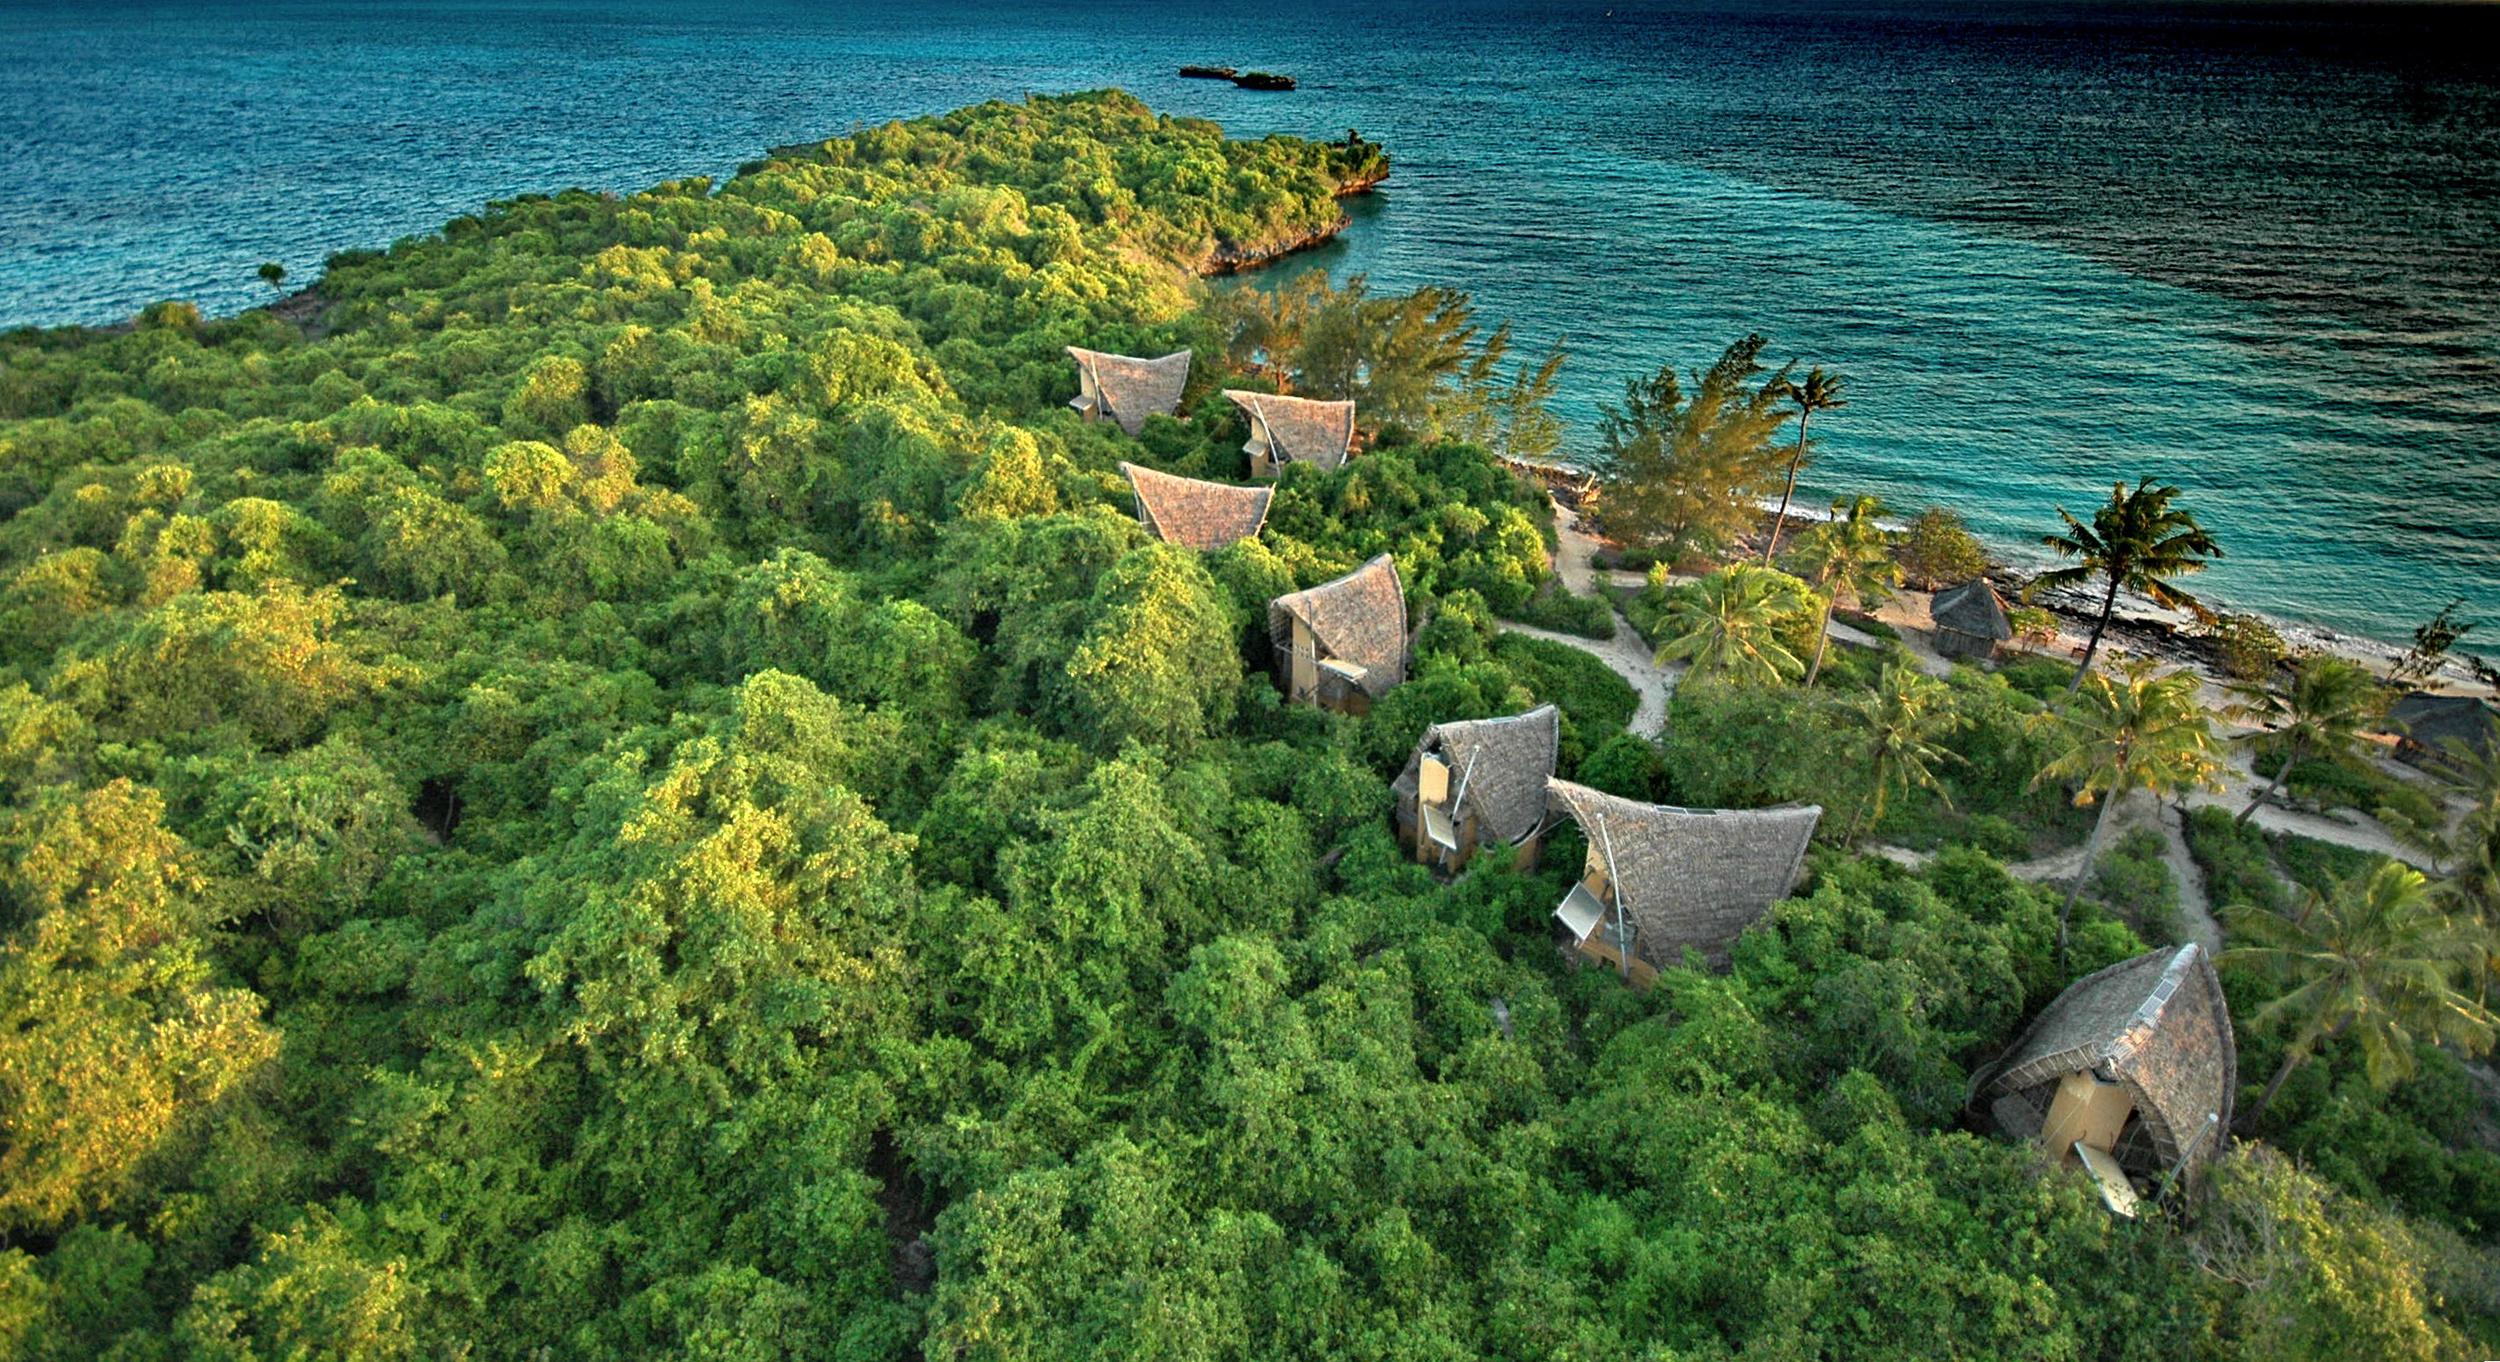 Image property of Chumbe Island